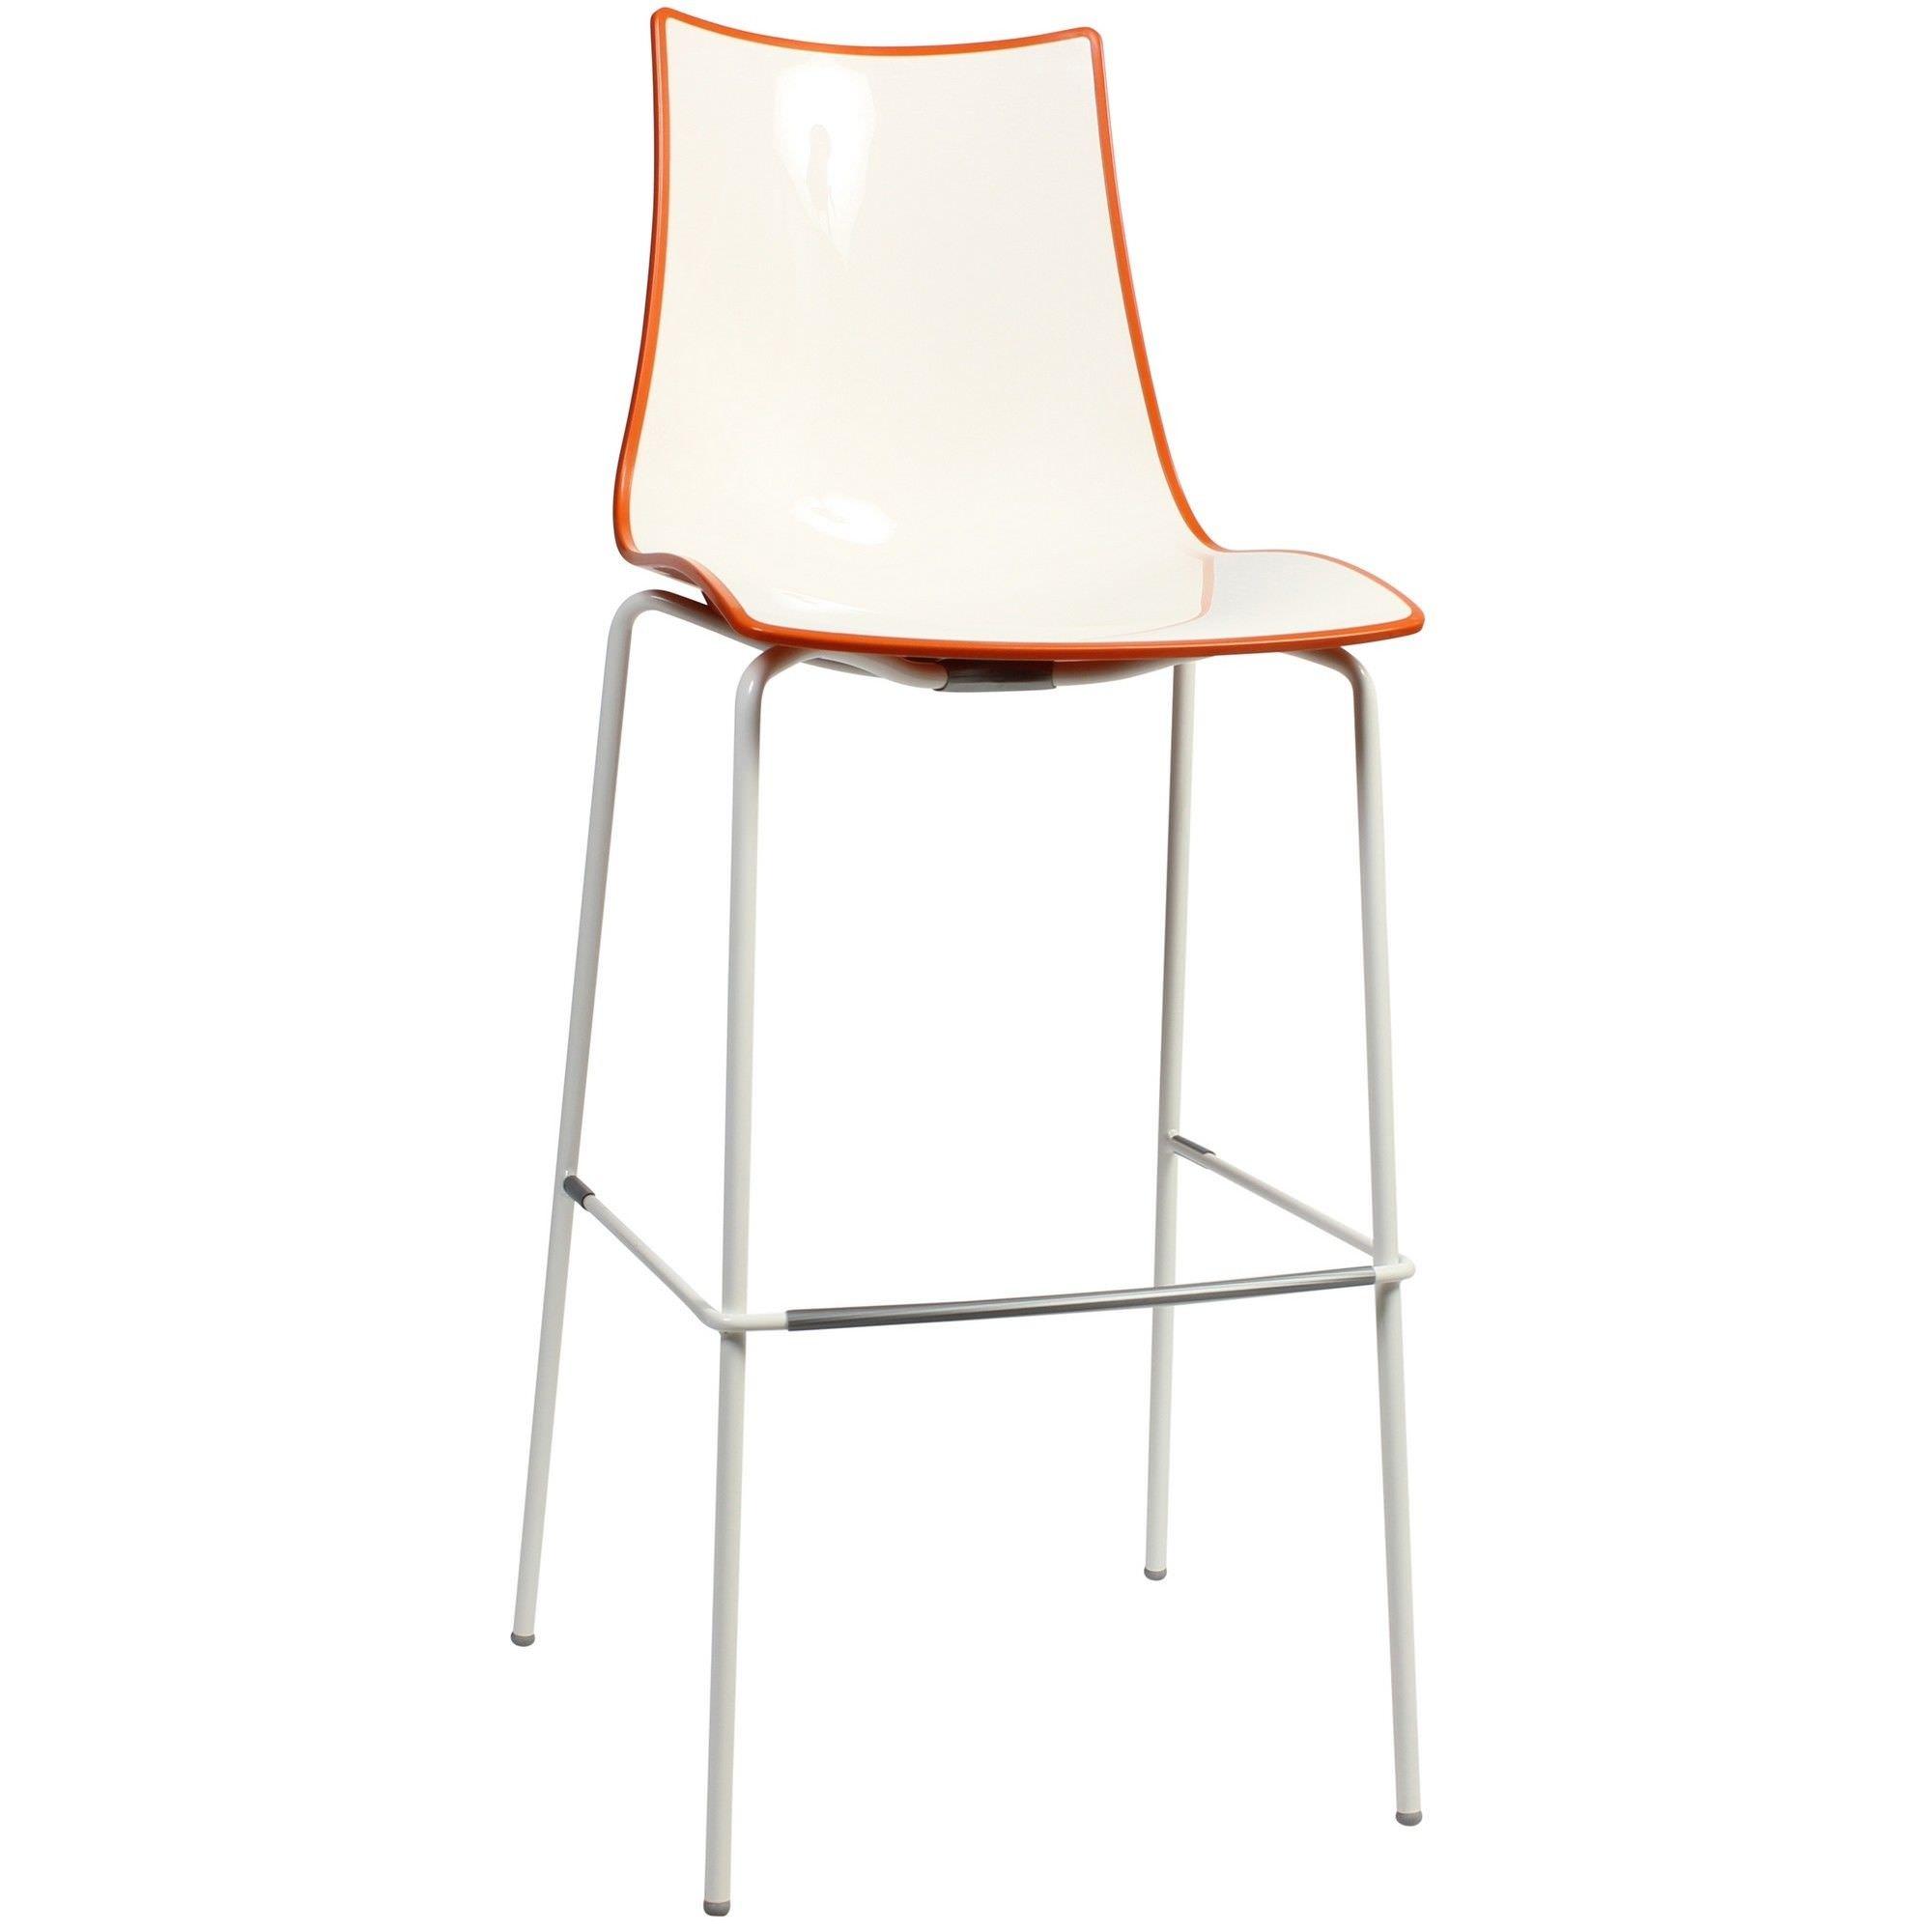 Zebra Bicolore Italian Made Commercial Grade Indoor/Outdoor Bar Stool, Metal Leg, Orange / White